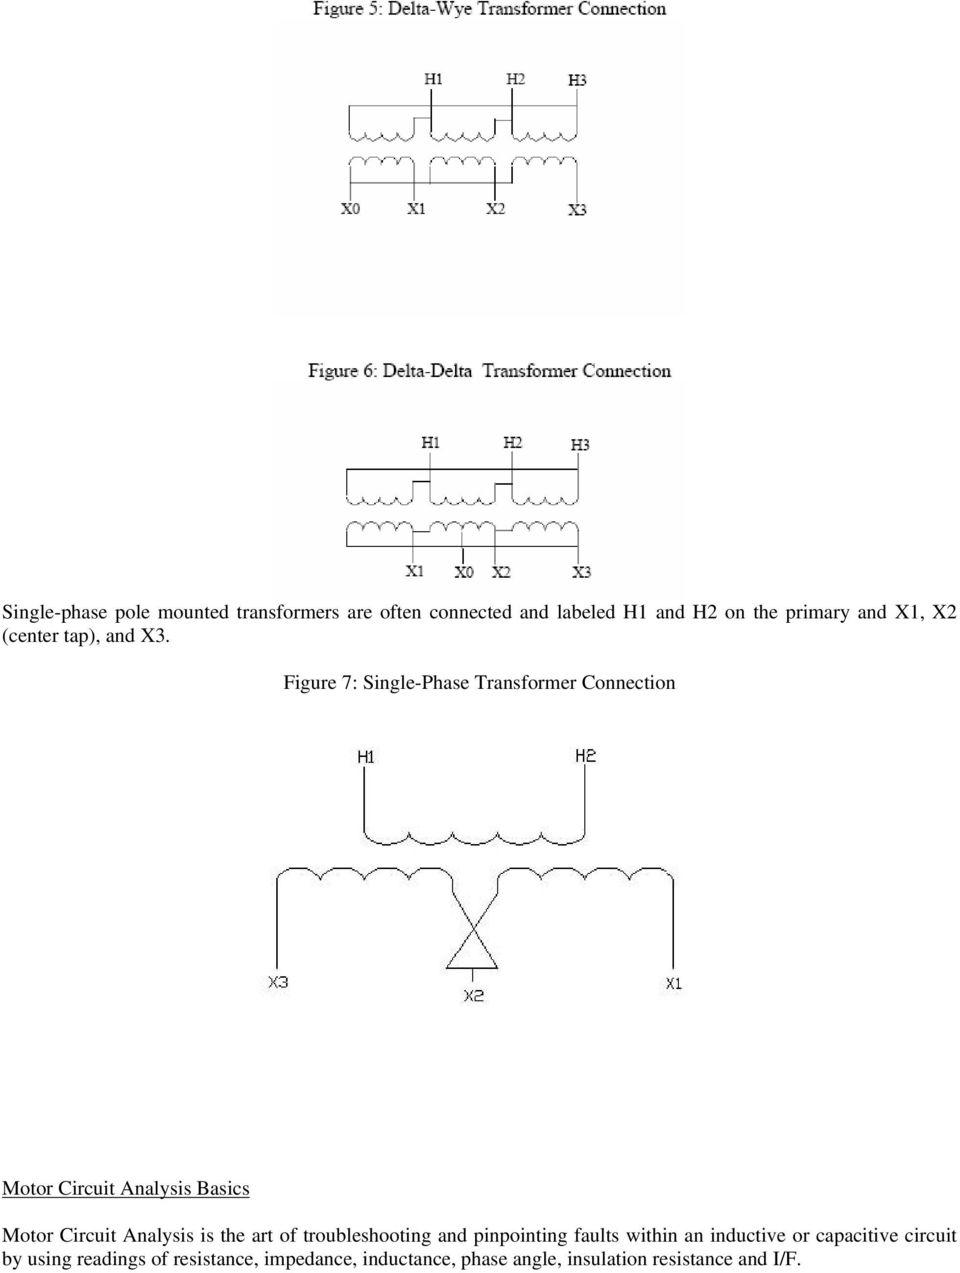 hight resolution of figure 7 single phase transformer connection motor circuit analysis basics motor circuit analysis is